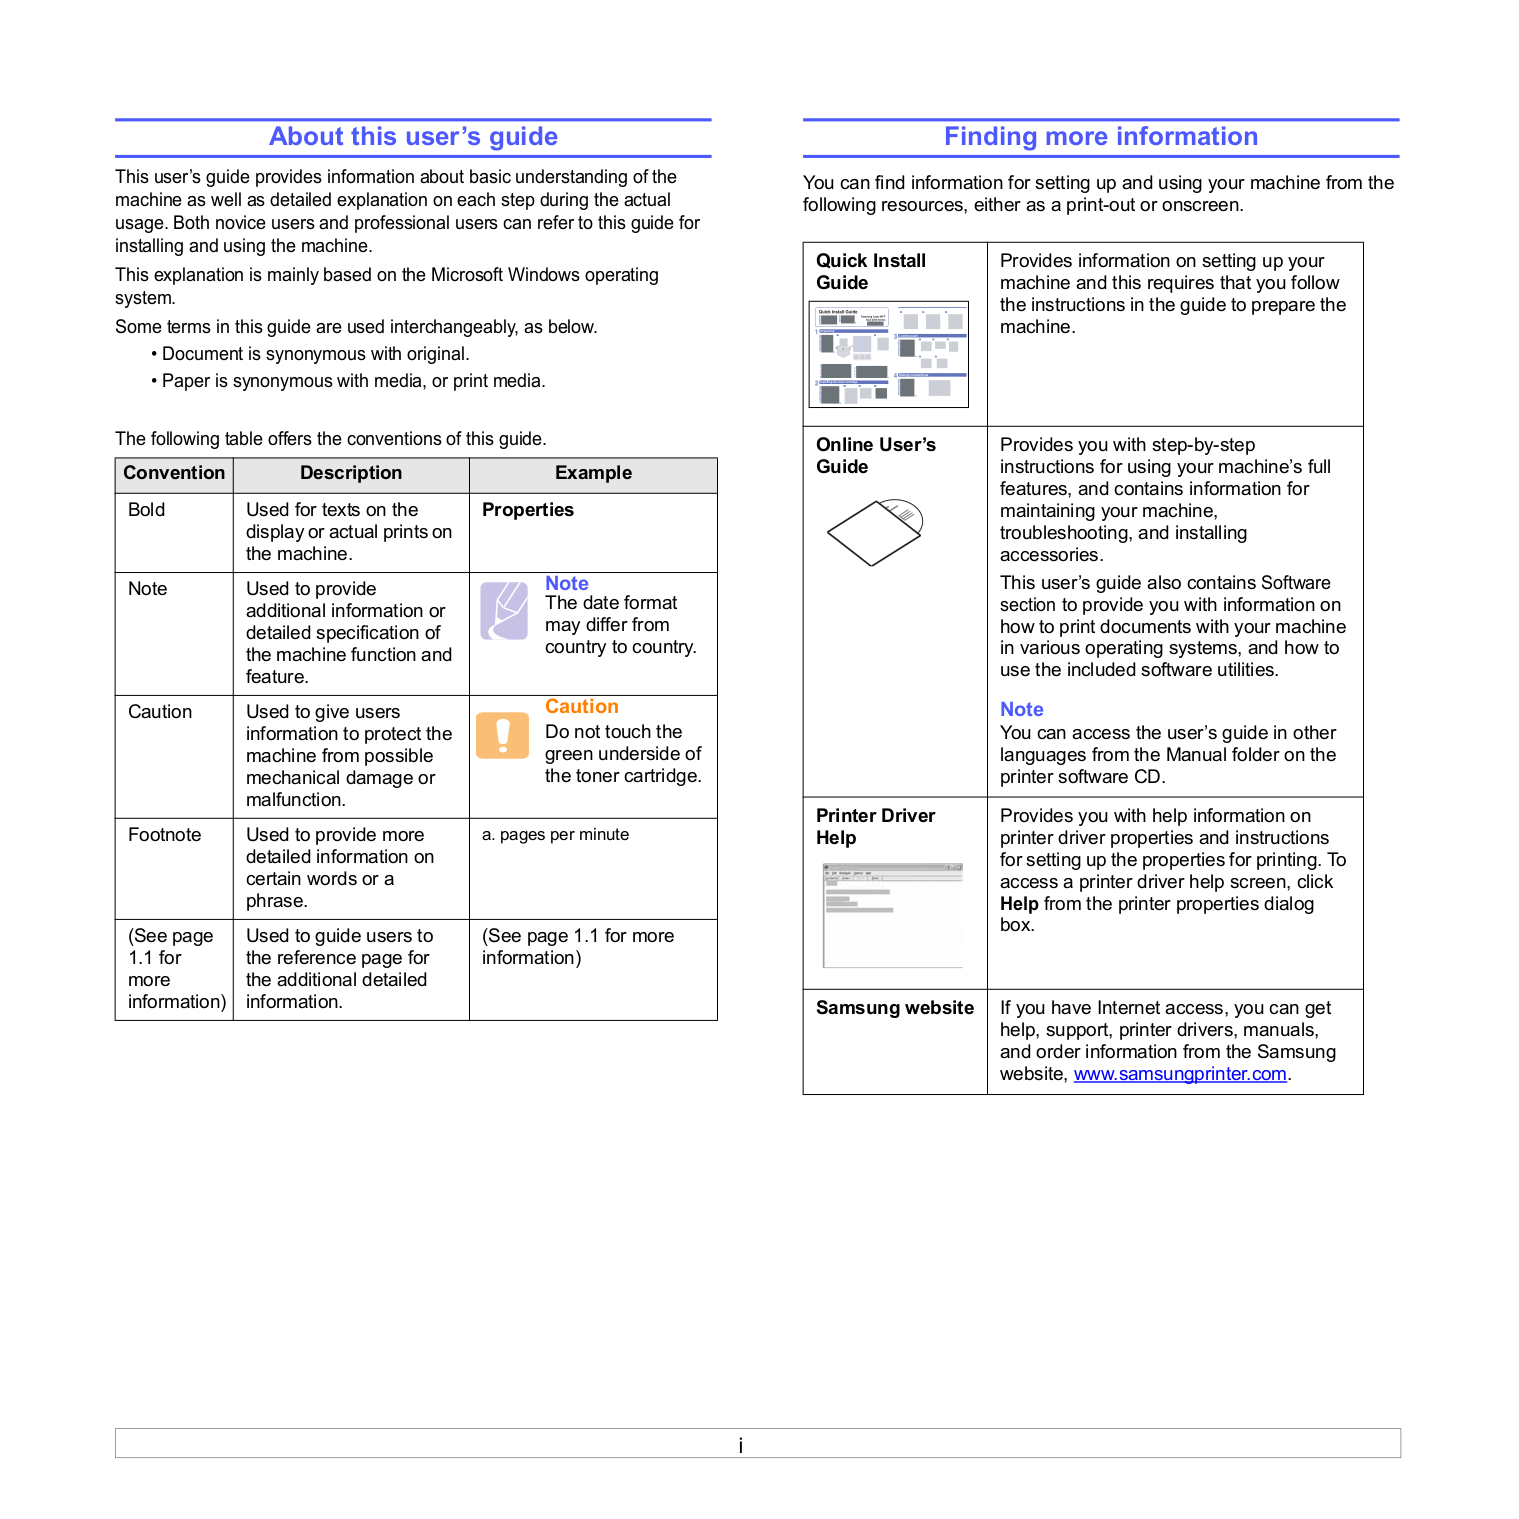 pdf manual for samsung printer ml 1630w rh umlib com Samsung TV Repair Manual Samsung TV Repair Manual